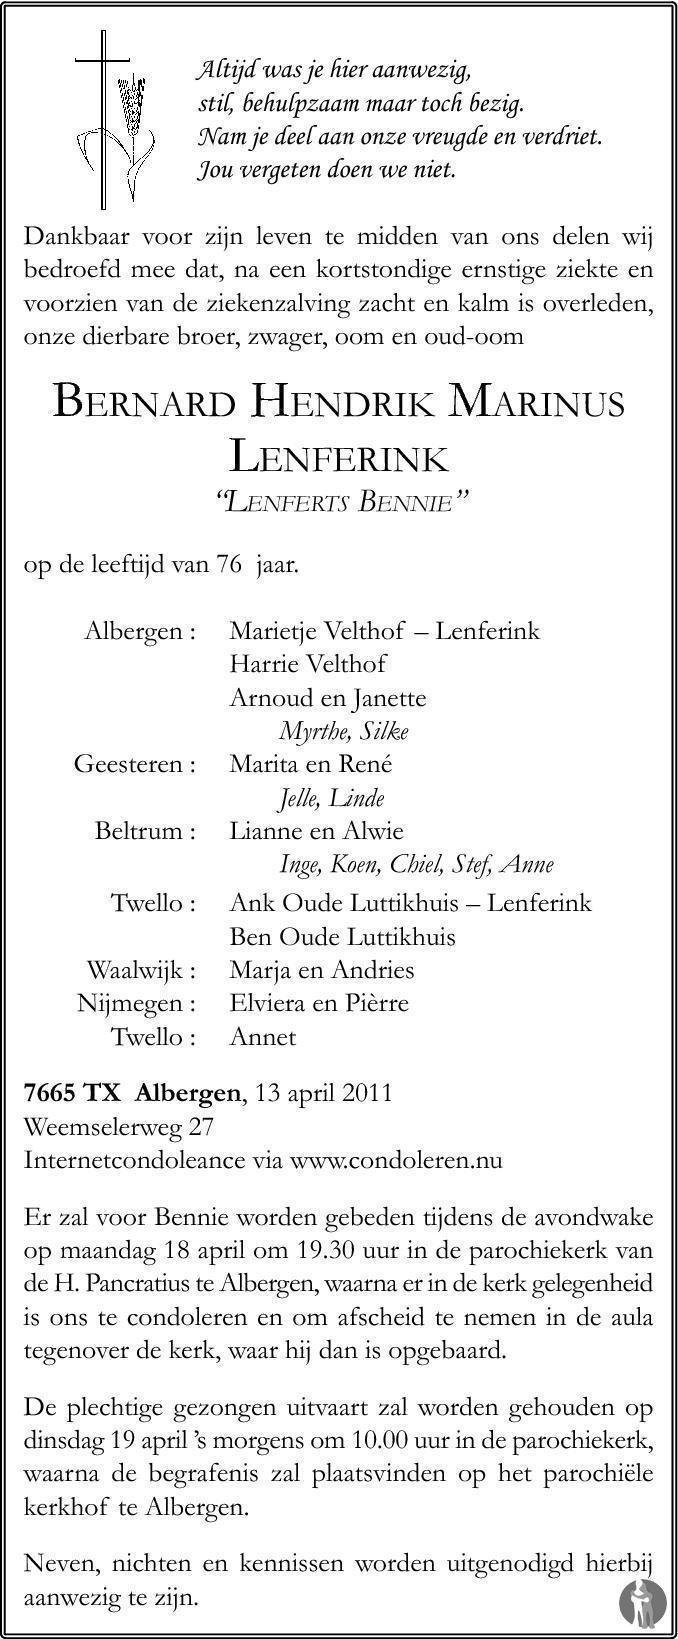 Bernard Hendrik Marinus Lenferts Bennie Lenferink 13 04